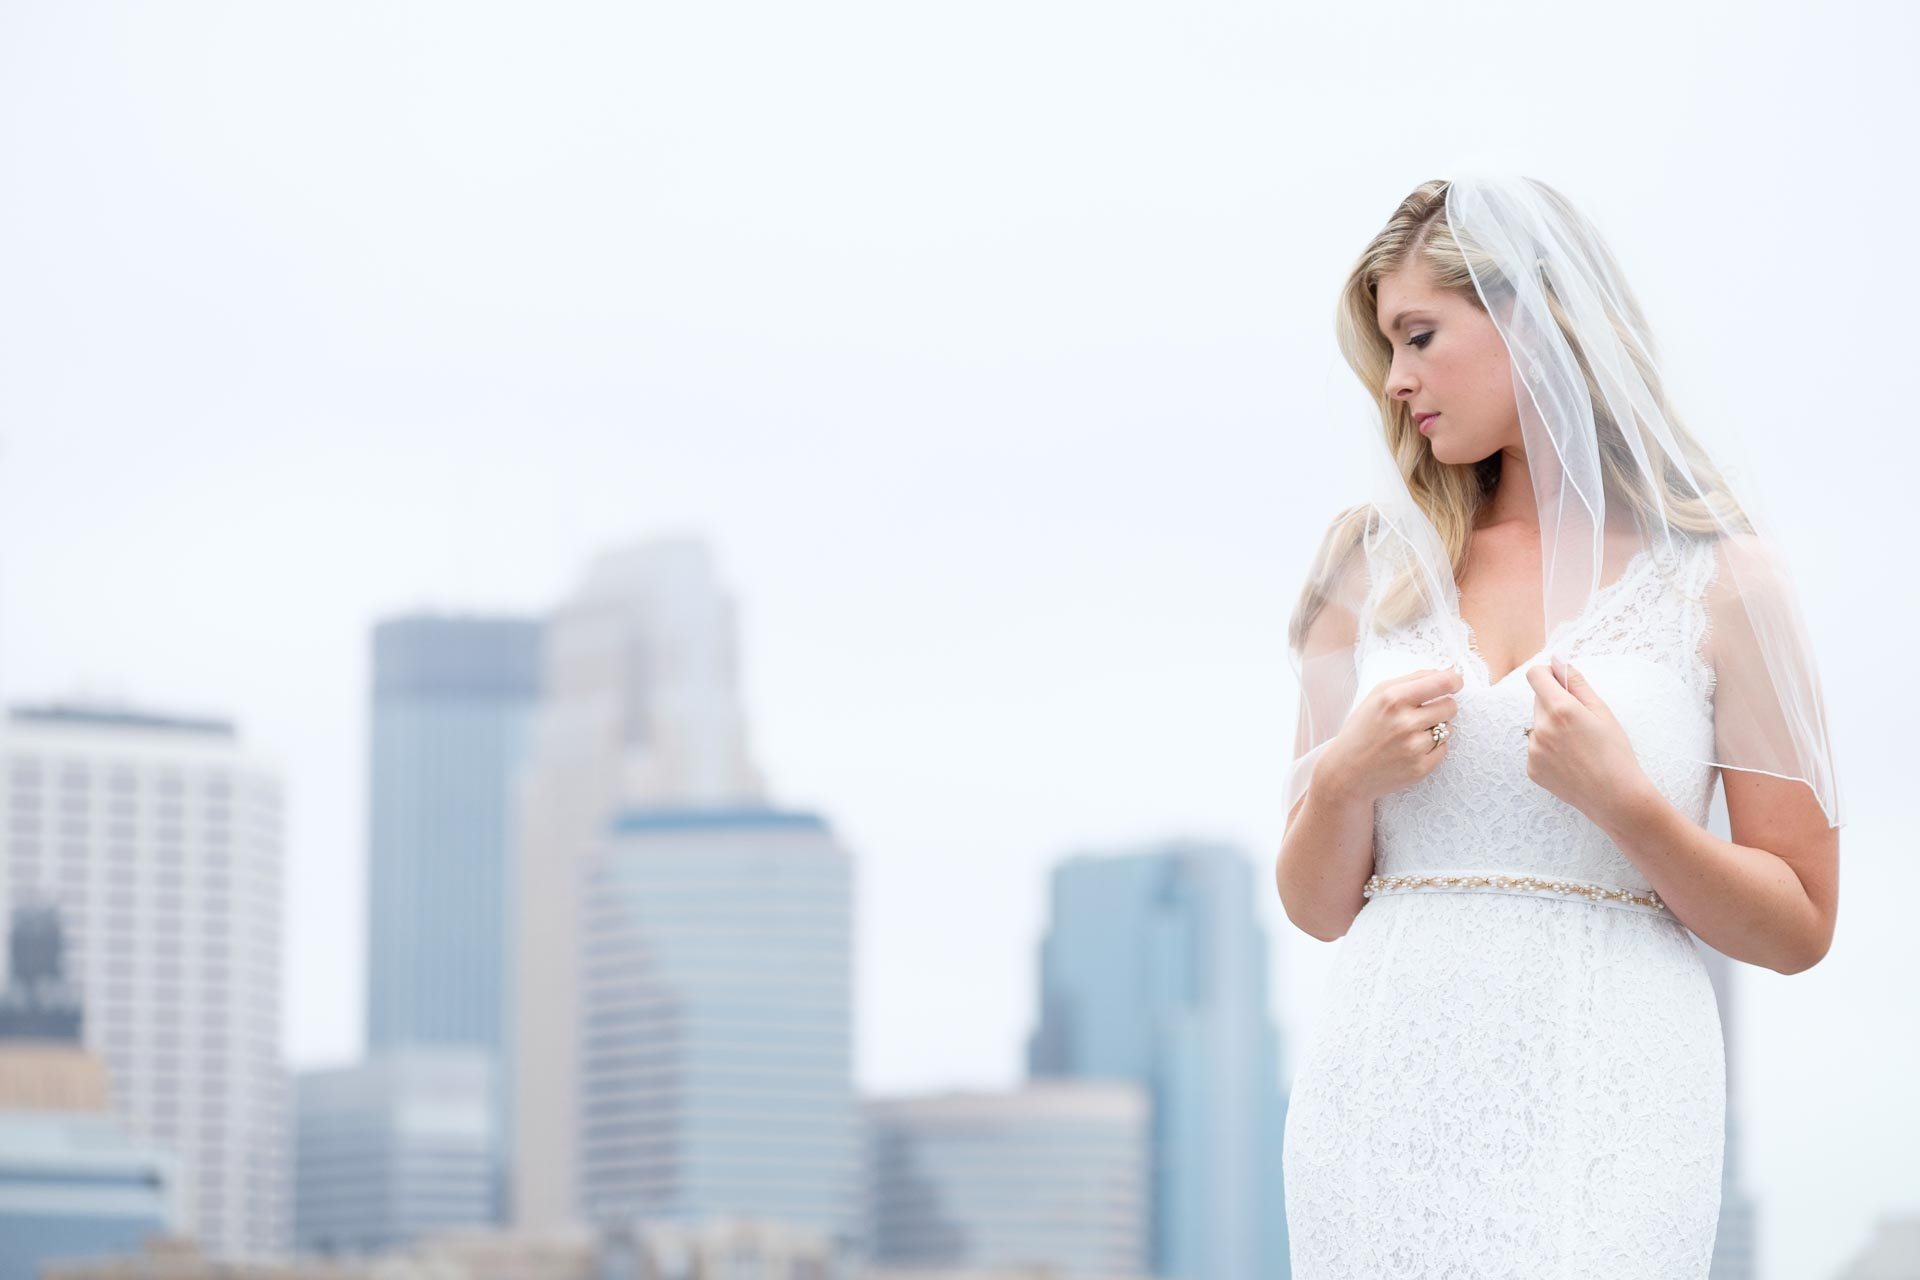 minneapolis-wedding-photographer-a-mill-artist-lofts0008